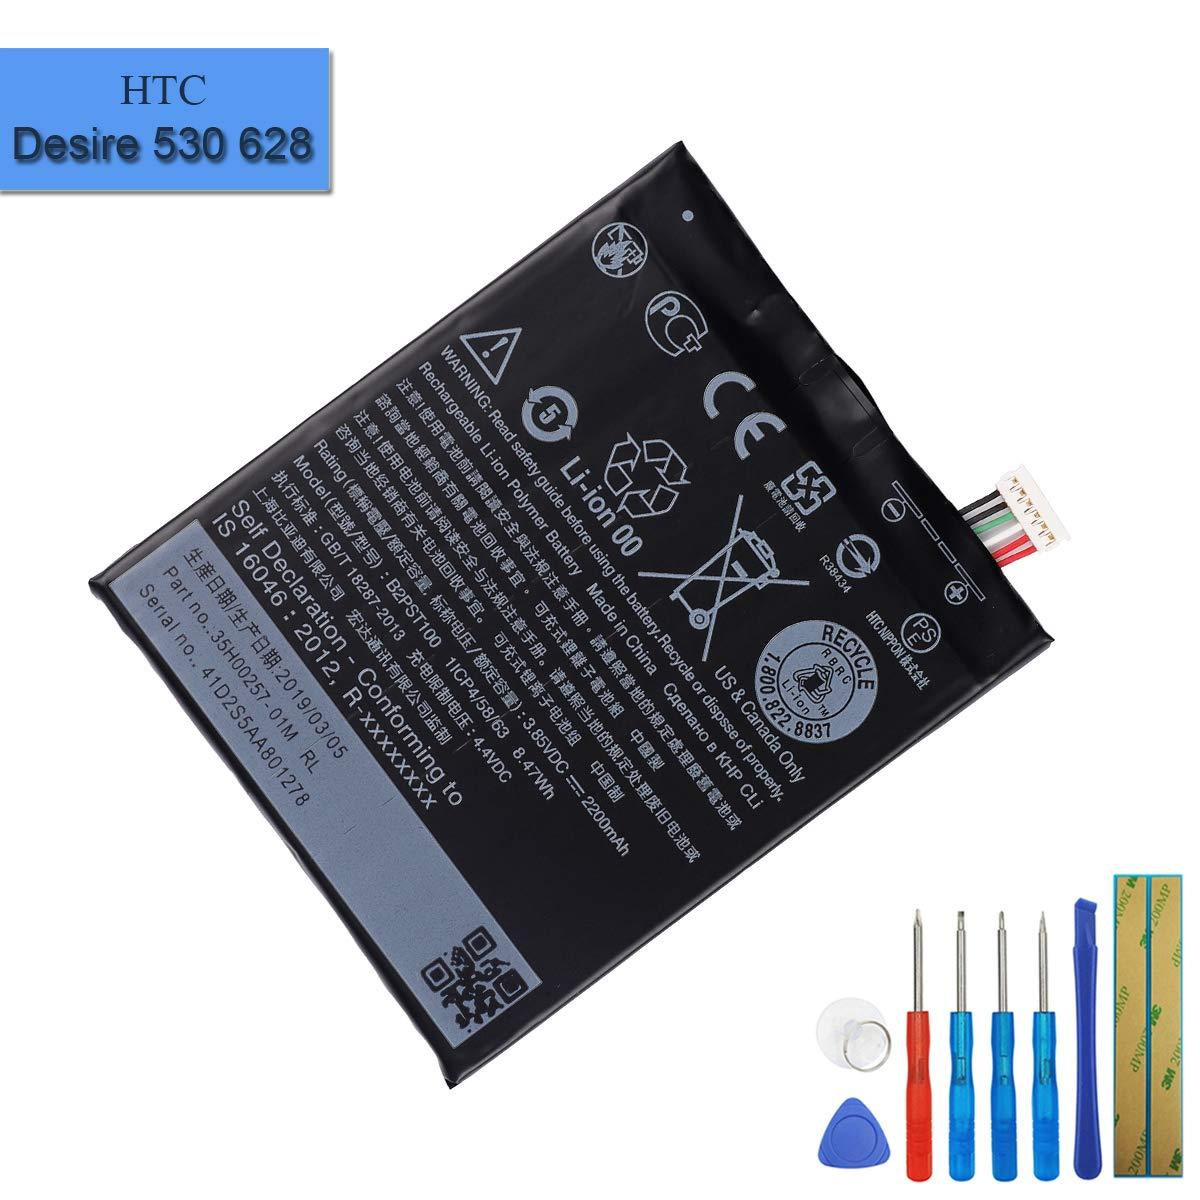 Bateria : Htc Desire 530 / Desire 628 / 630 / 650 B2pst100